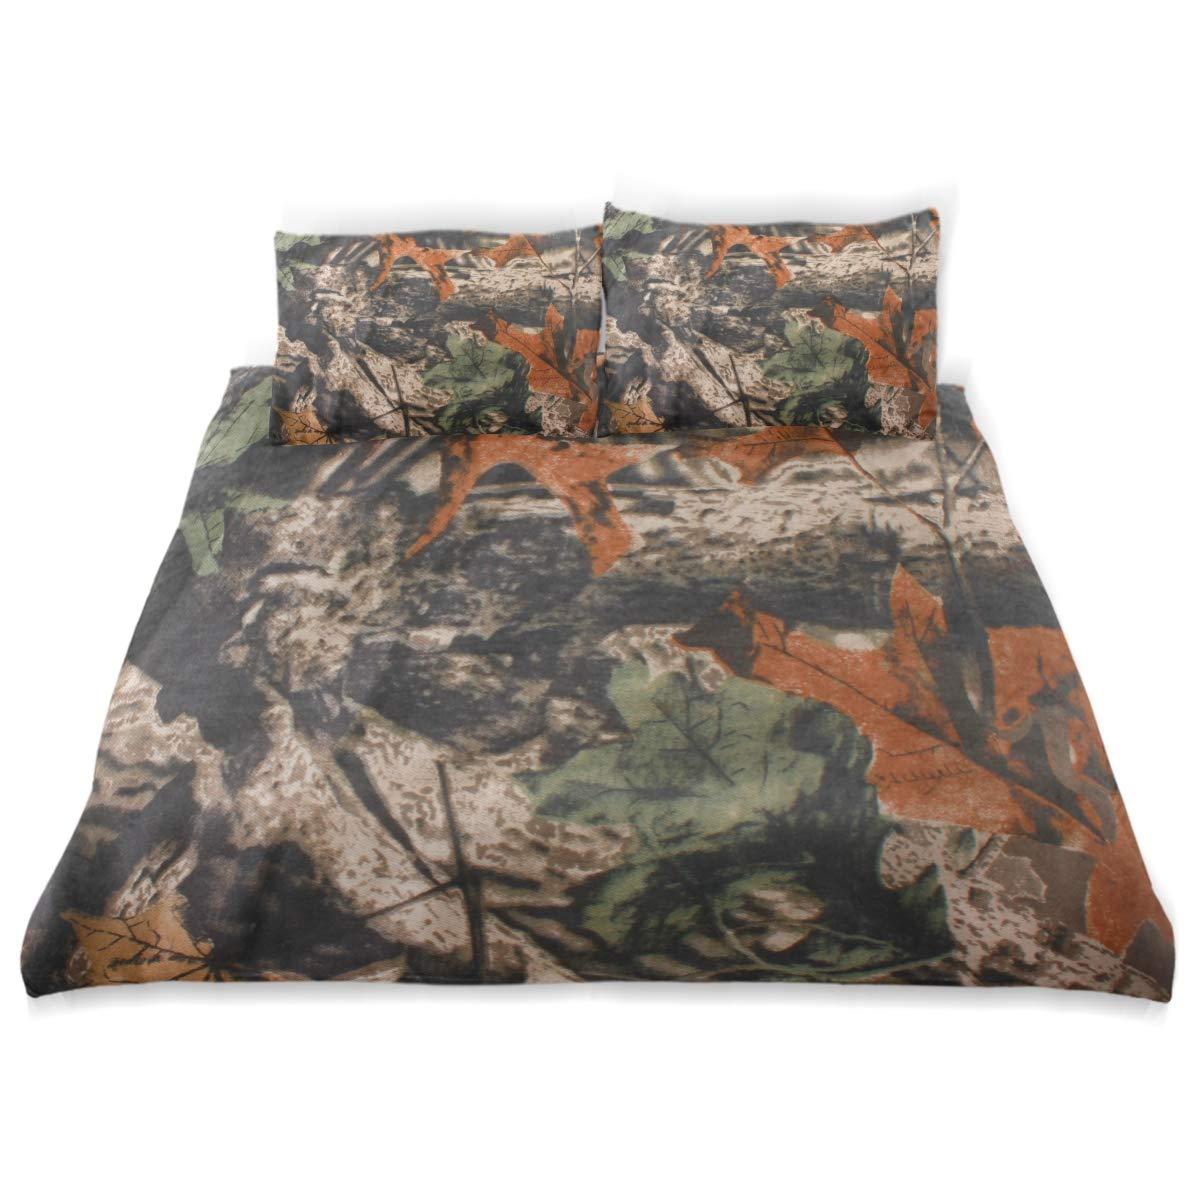 ALAZA 迷彩柄 森の木 掛け布団カバー 3点セット 枕カバー2枚付き 寝具セット 装飾用 子供用 B07L8HMLSR